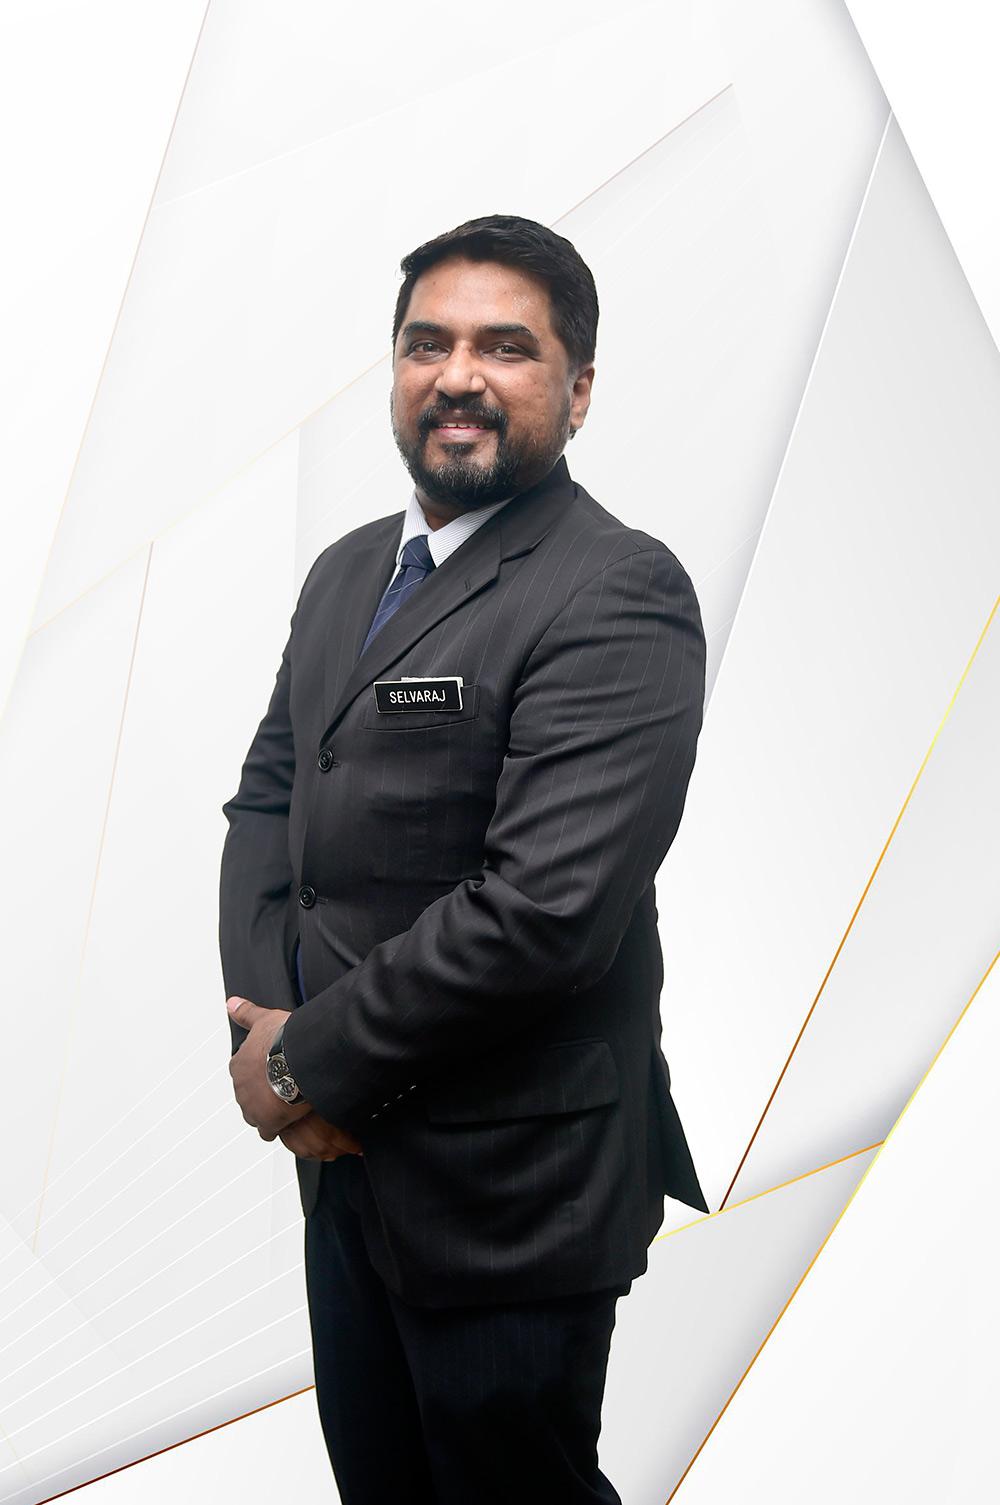 YBrs. Dr. Selvaraj Ramasamy Abdullah